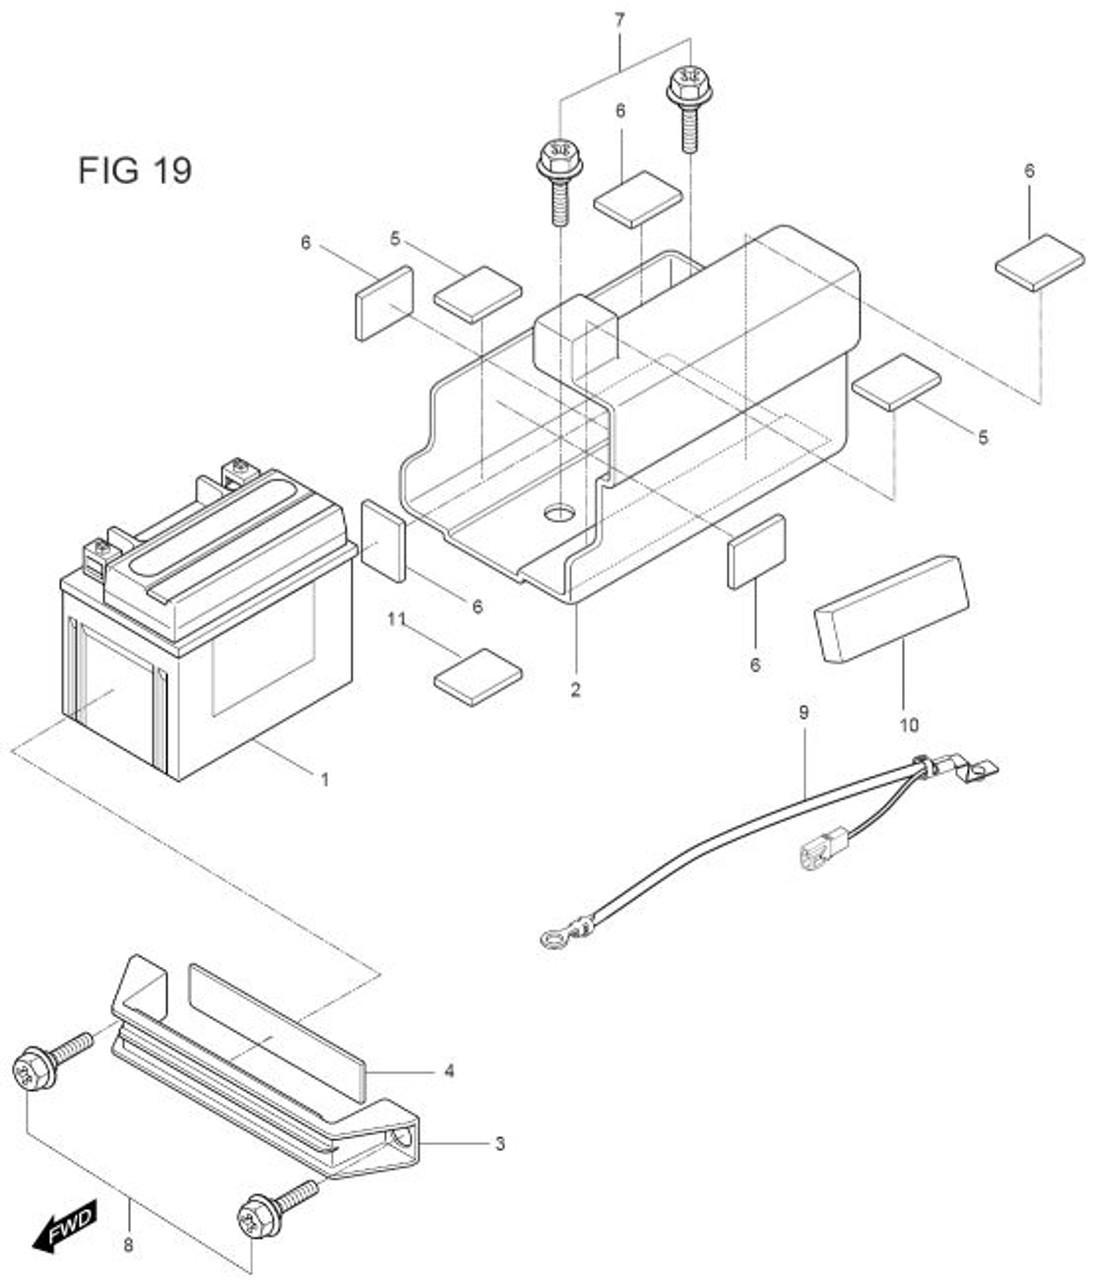 Hyosung Gv250 Wiring Diagram | Wiring Diagram